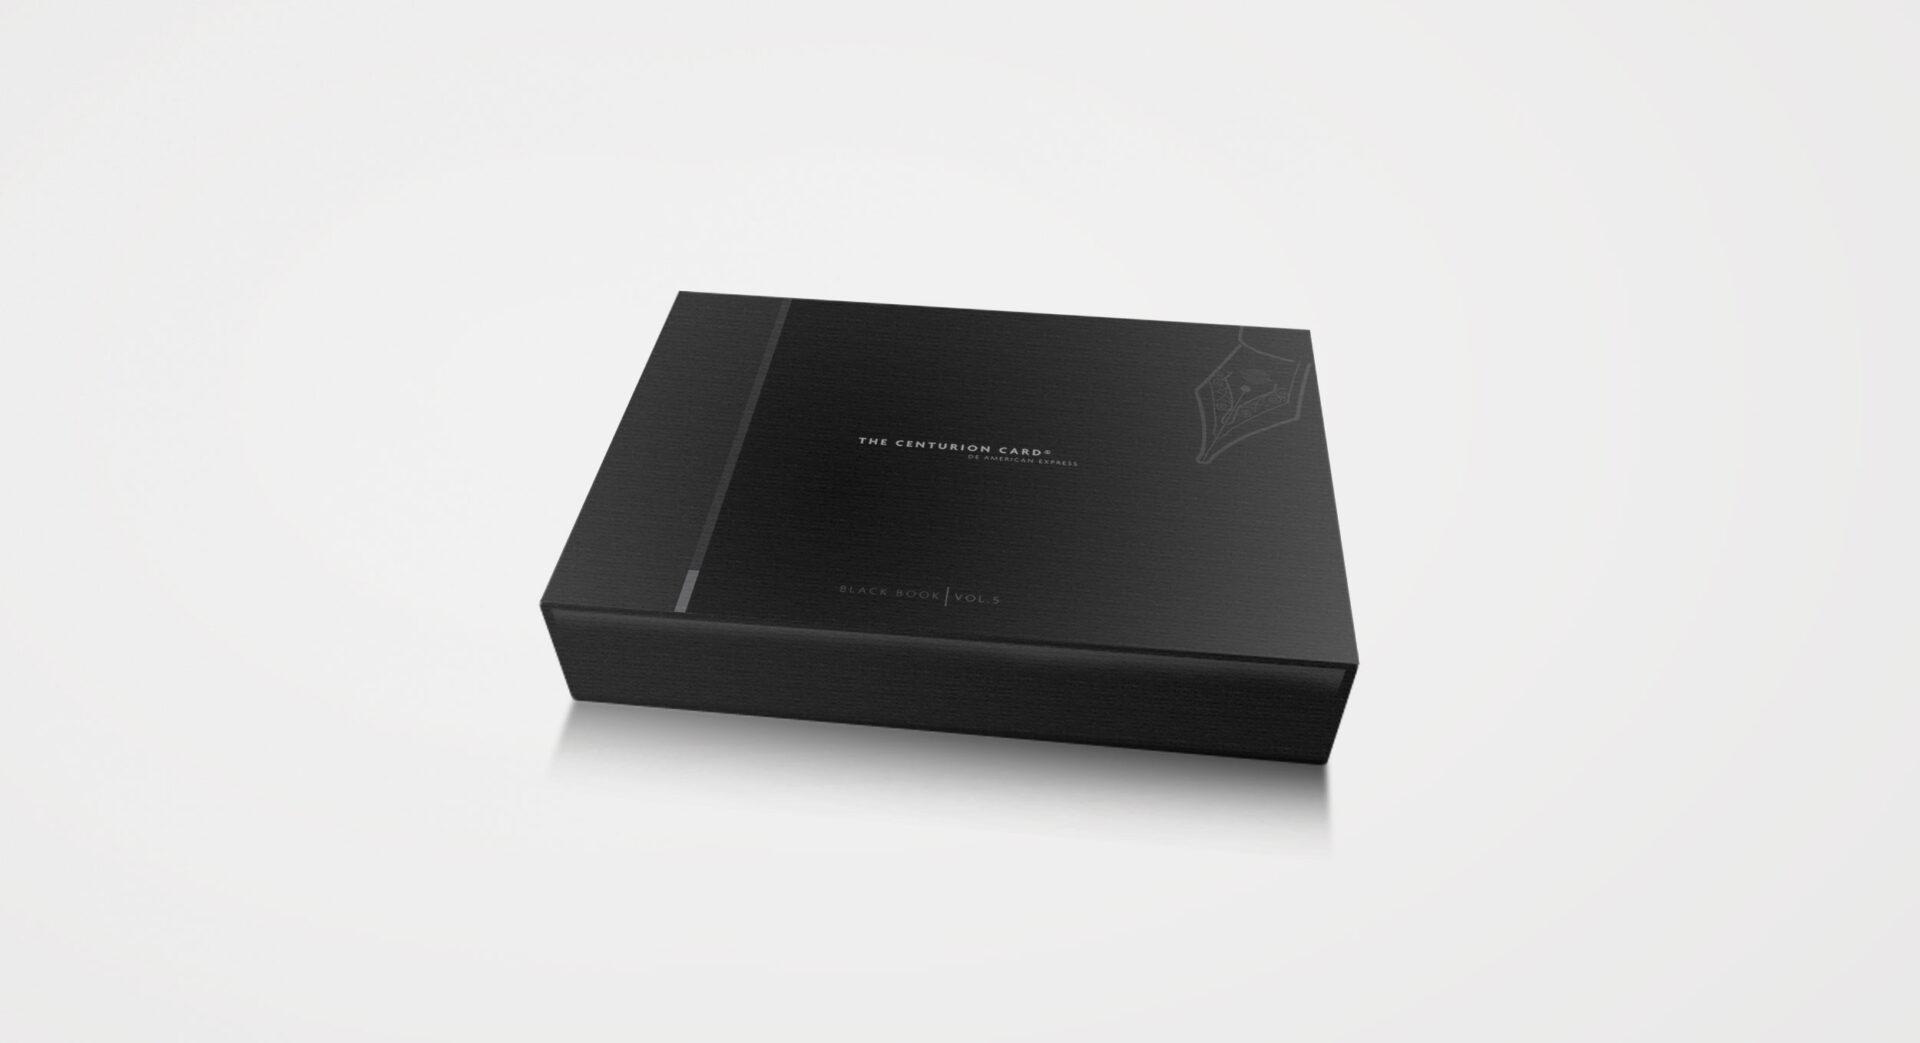 06_amex-centurion_black_book